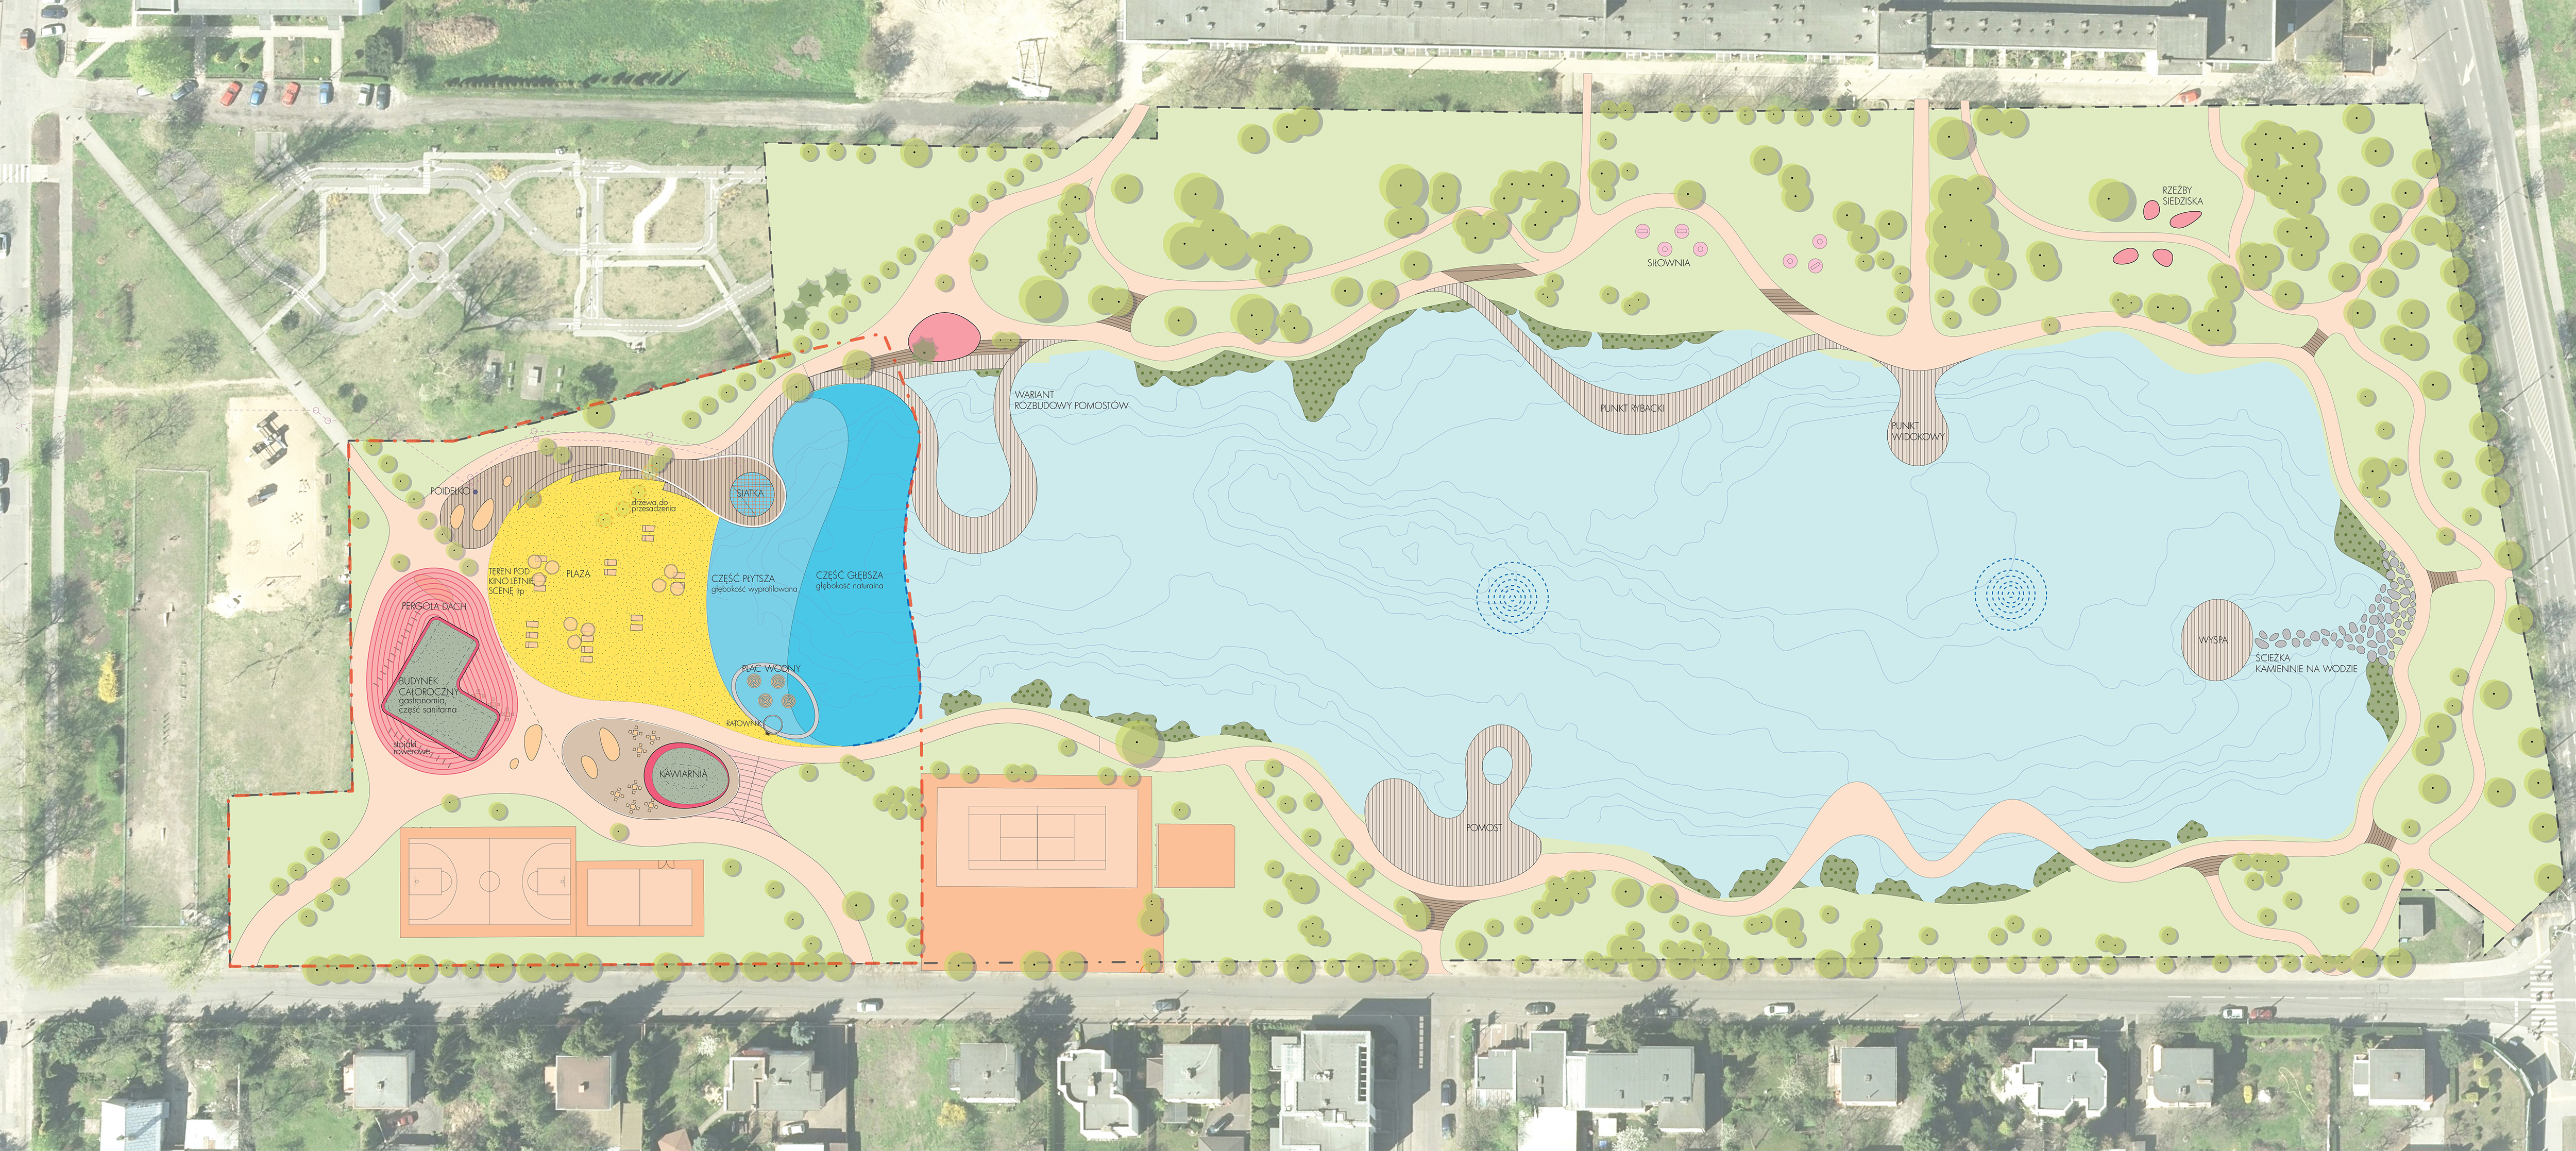 005 Bydgoszcz plan